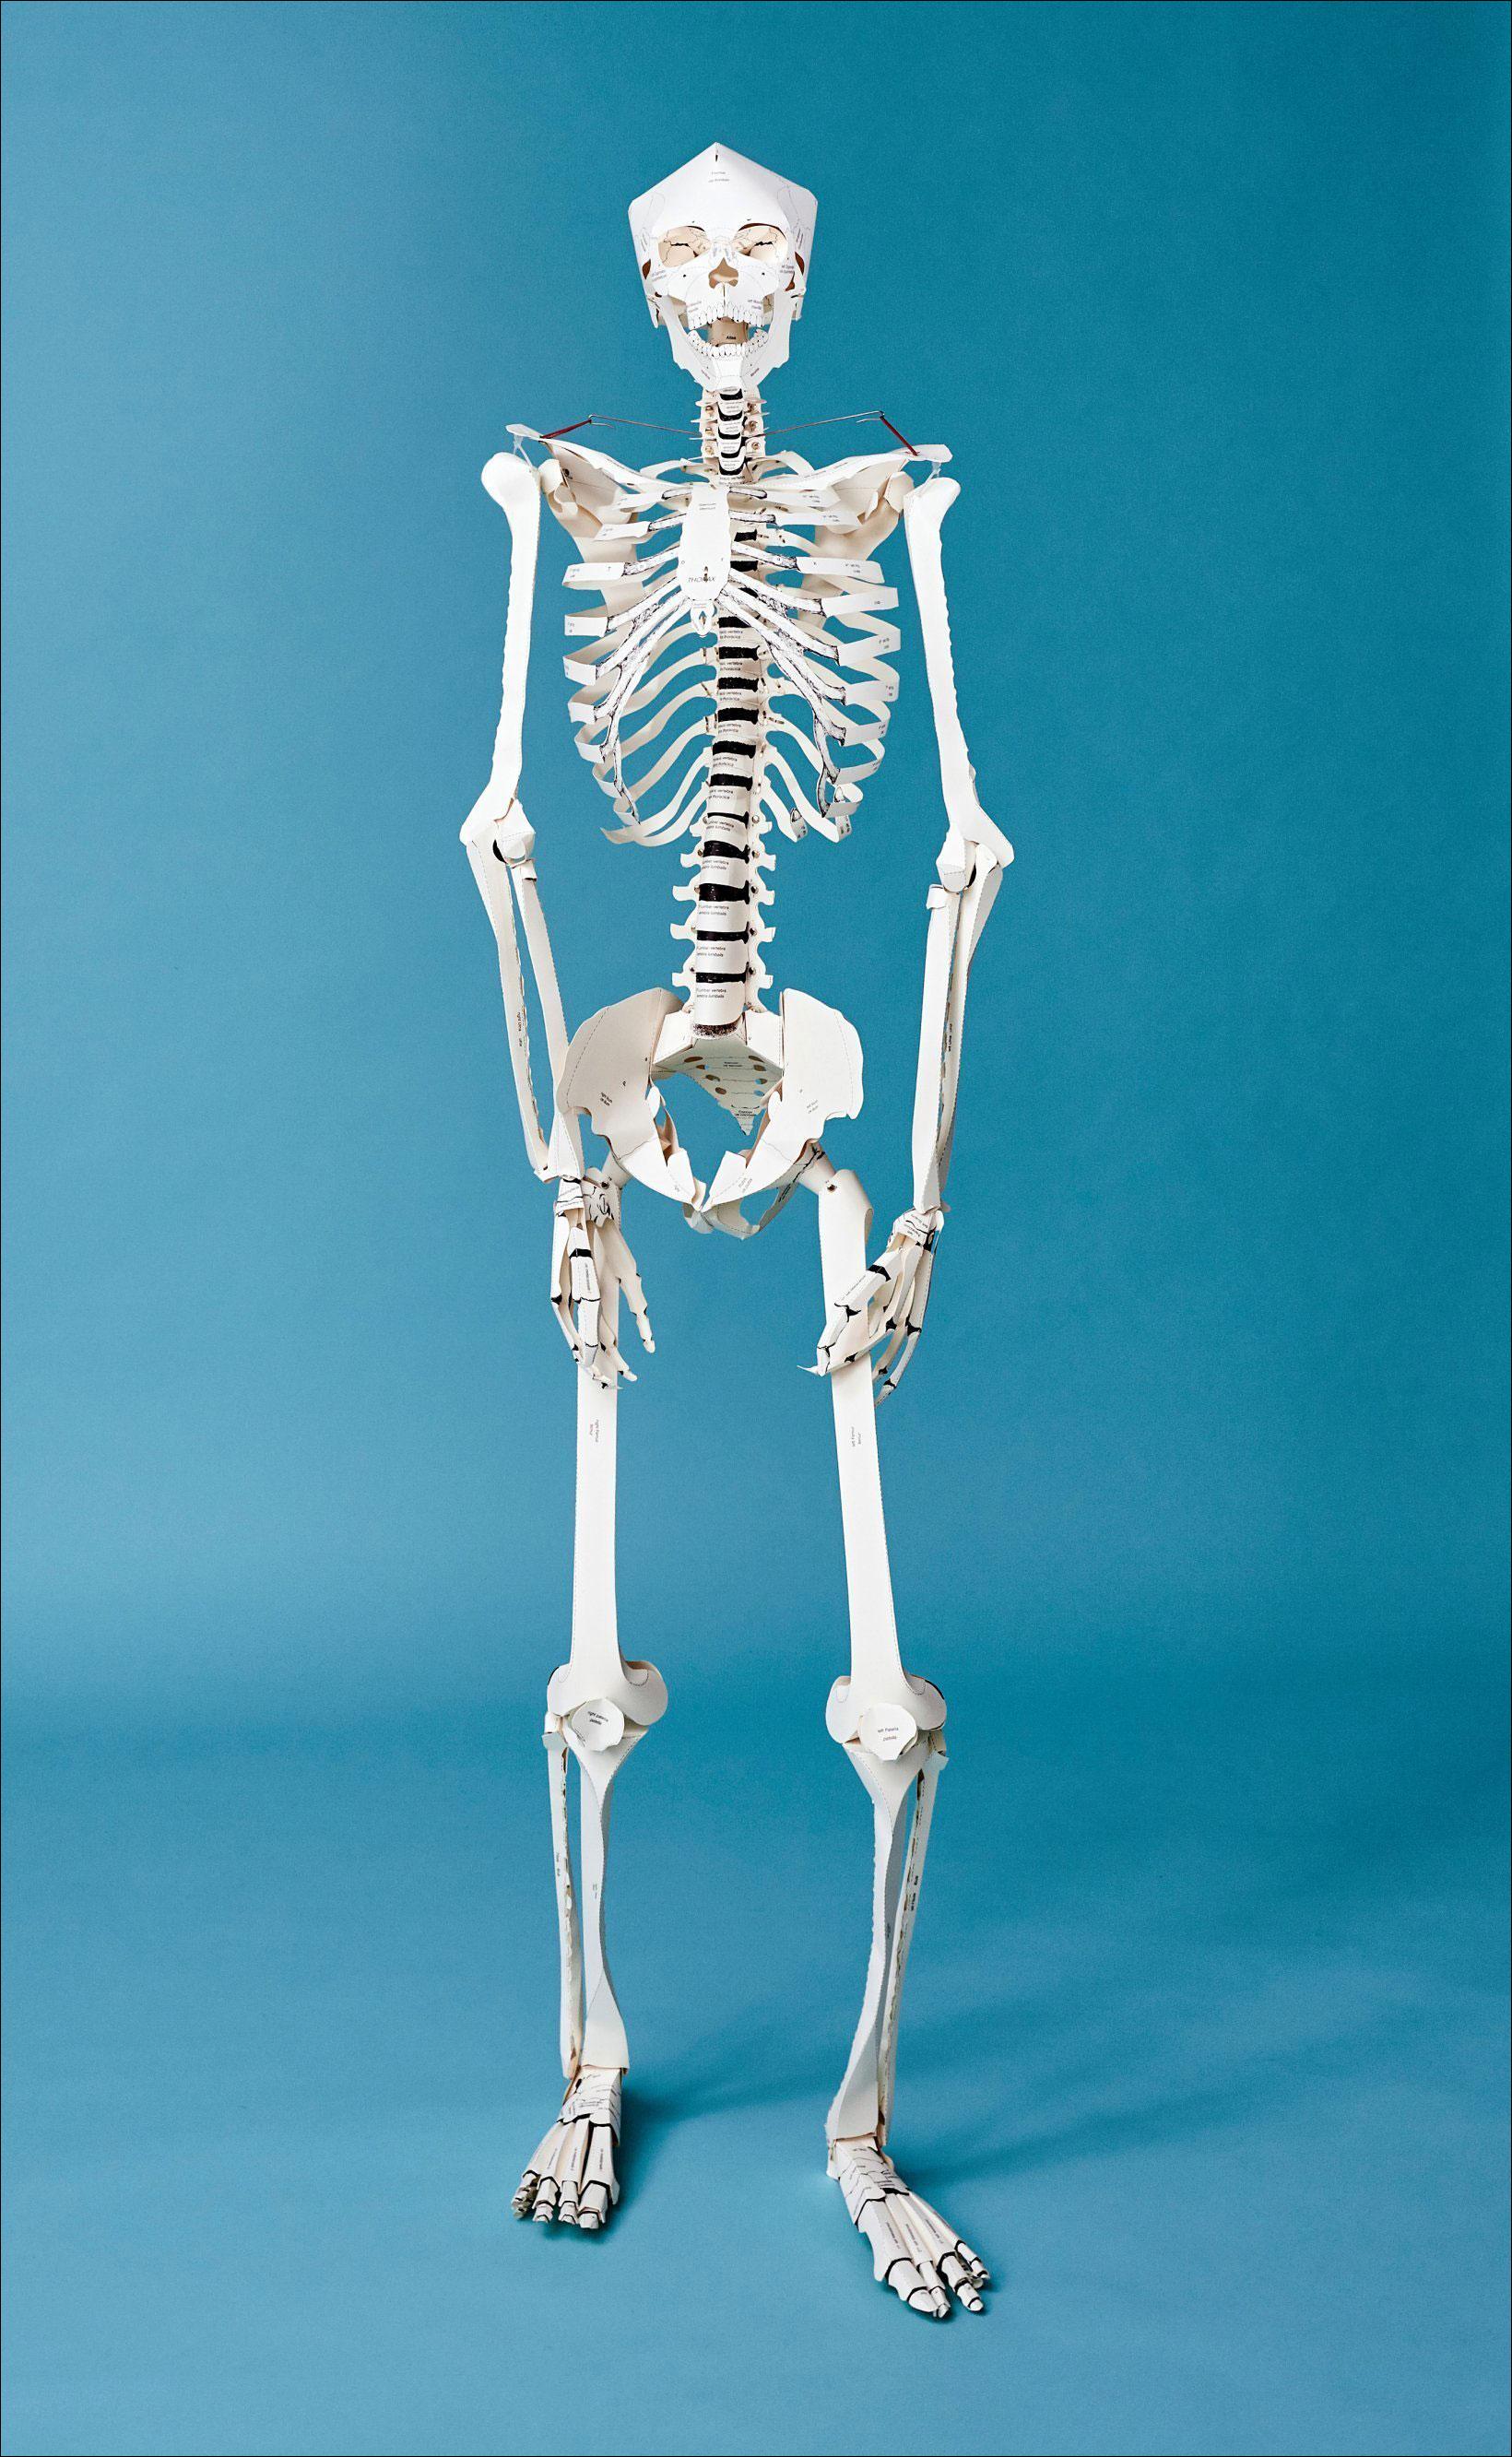 Bild Der Wissenschaft Shop Build Your Own Human Skeleton Life